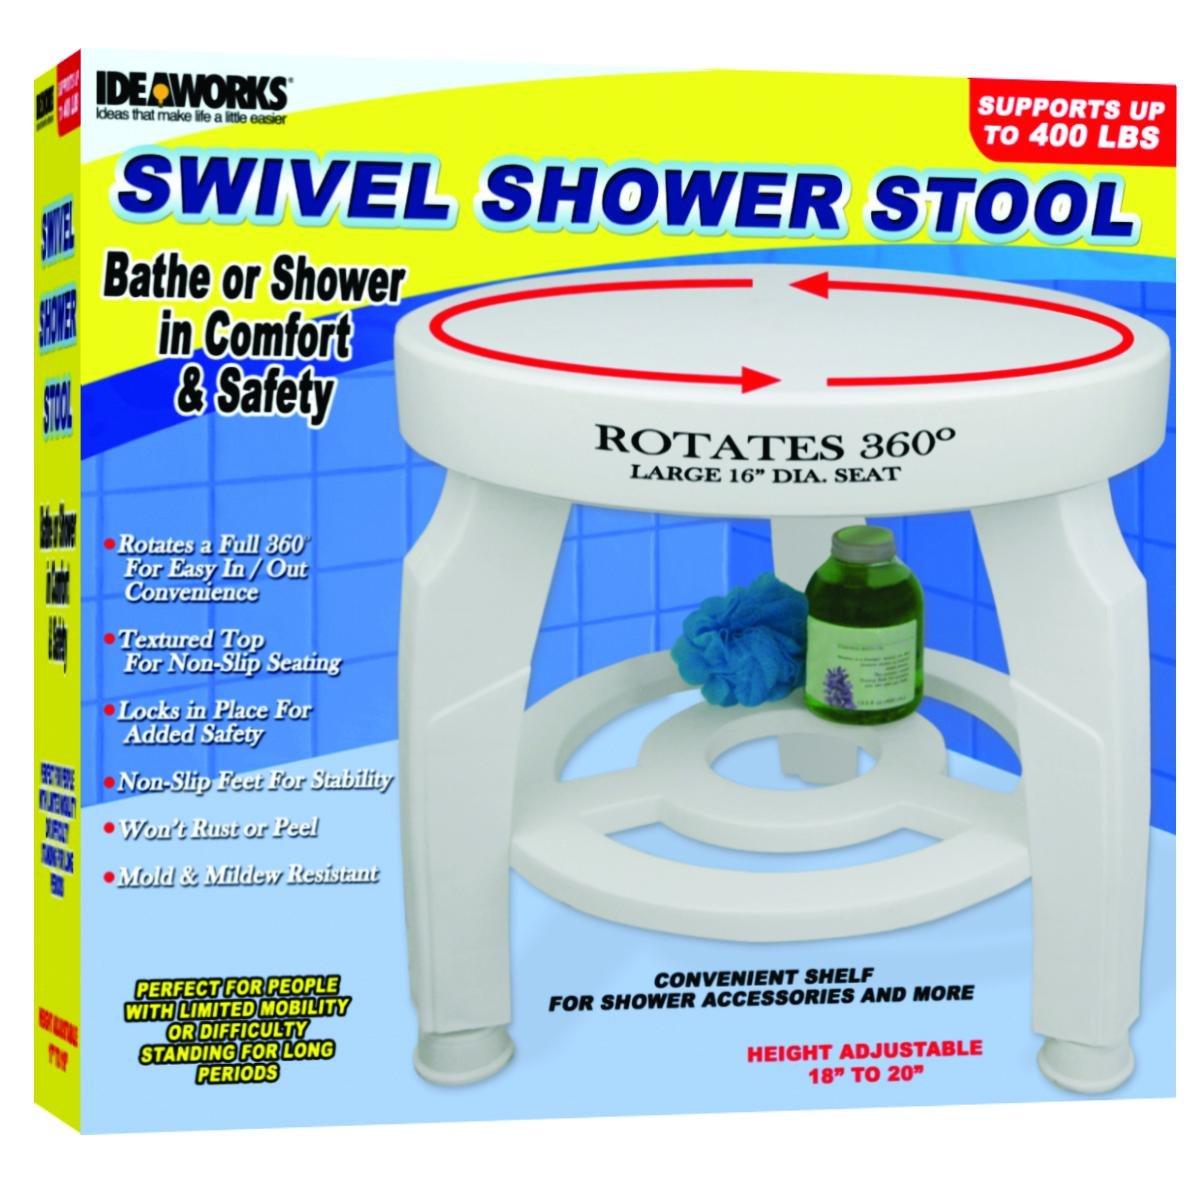 JIIJB5596 - Swivel Shower Stool, 16-1/2 dia. Seat, Height Adjustable from 17 - 19